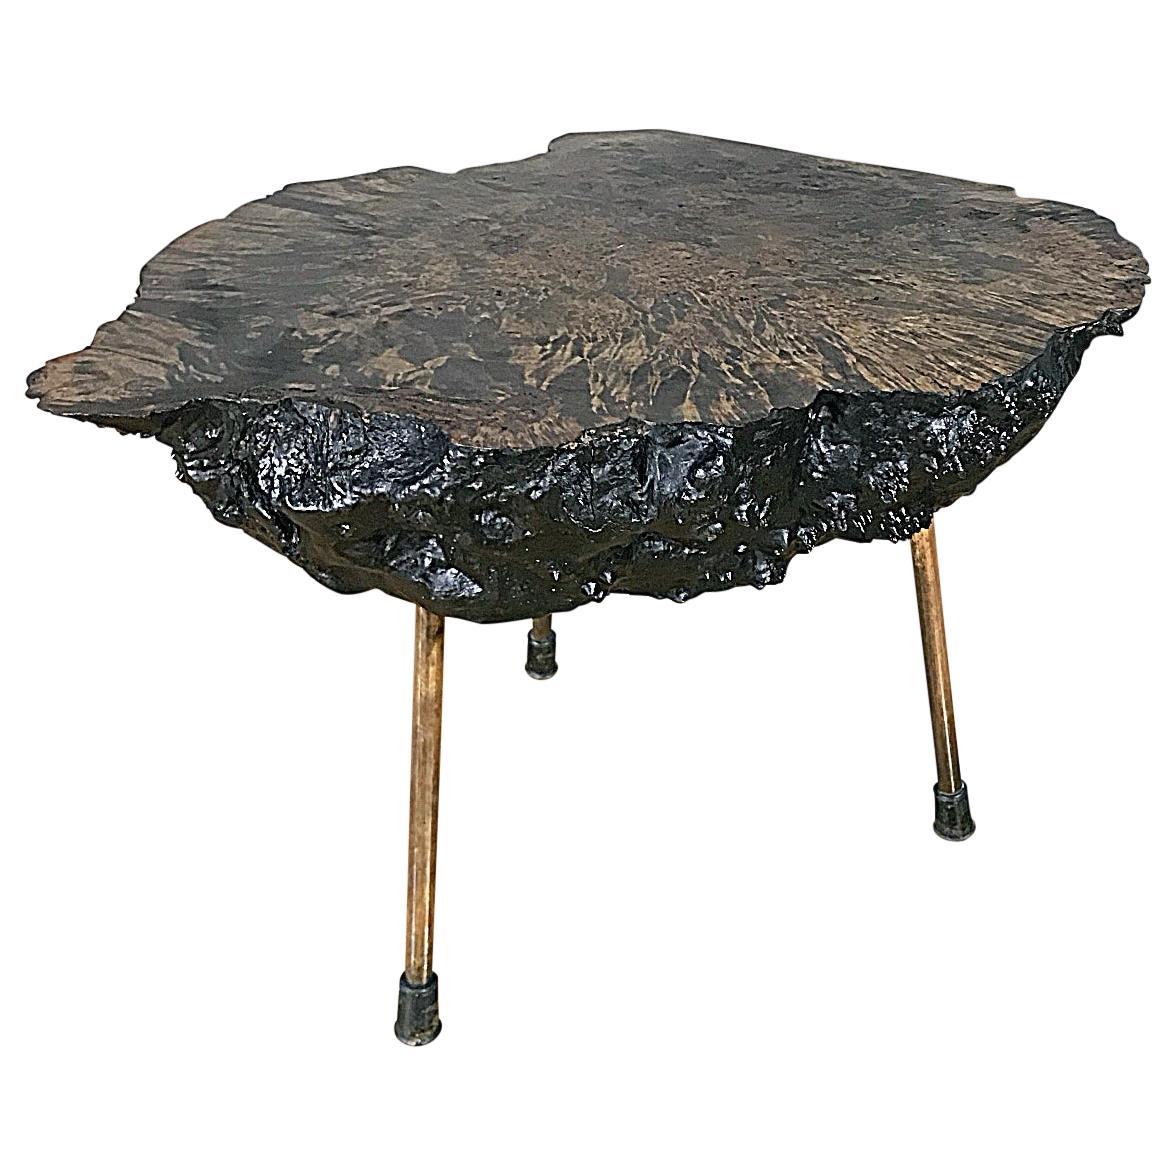 Carl Auböck Large Midcentury Tree Trunk Table, 1950s, Austria